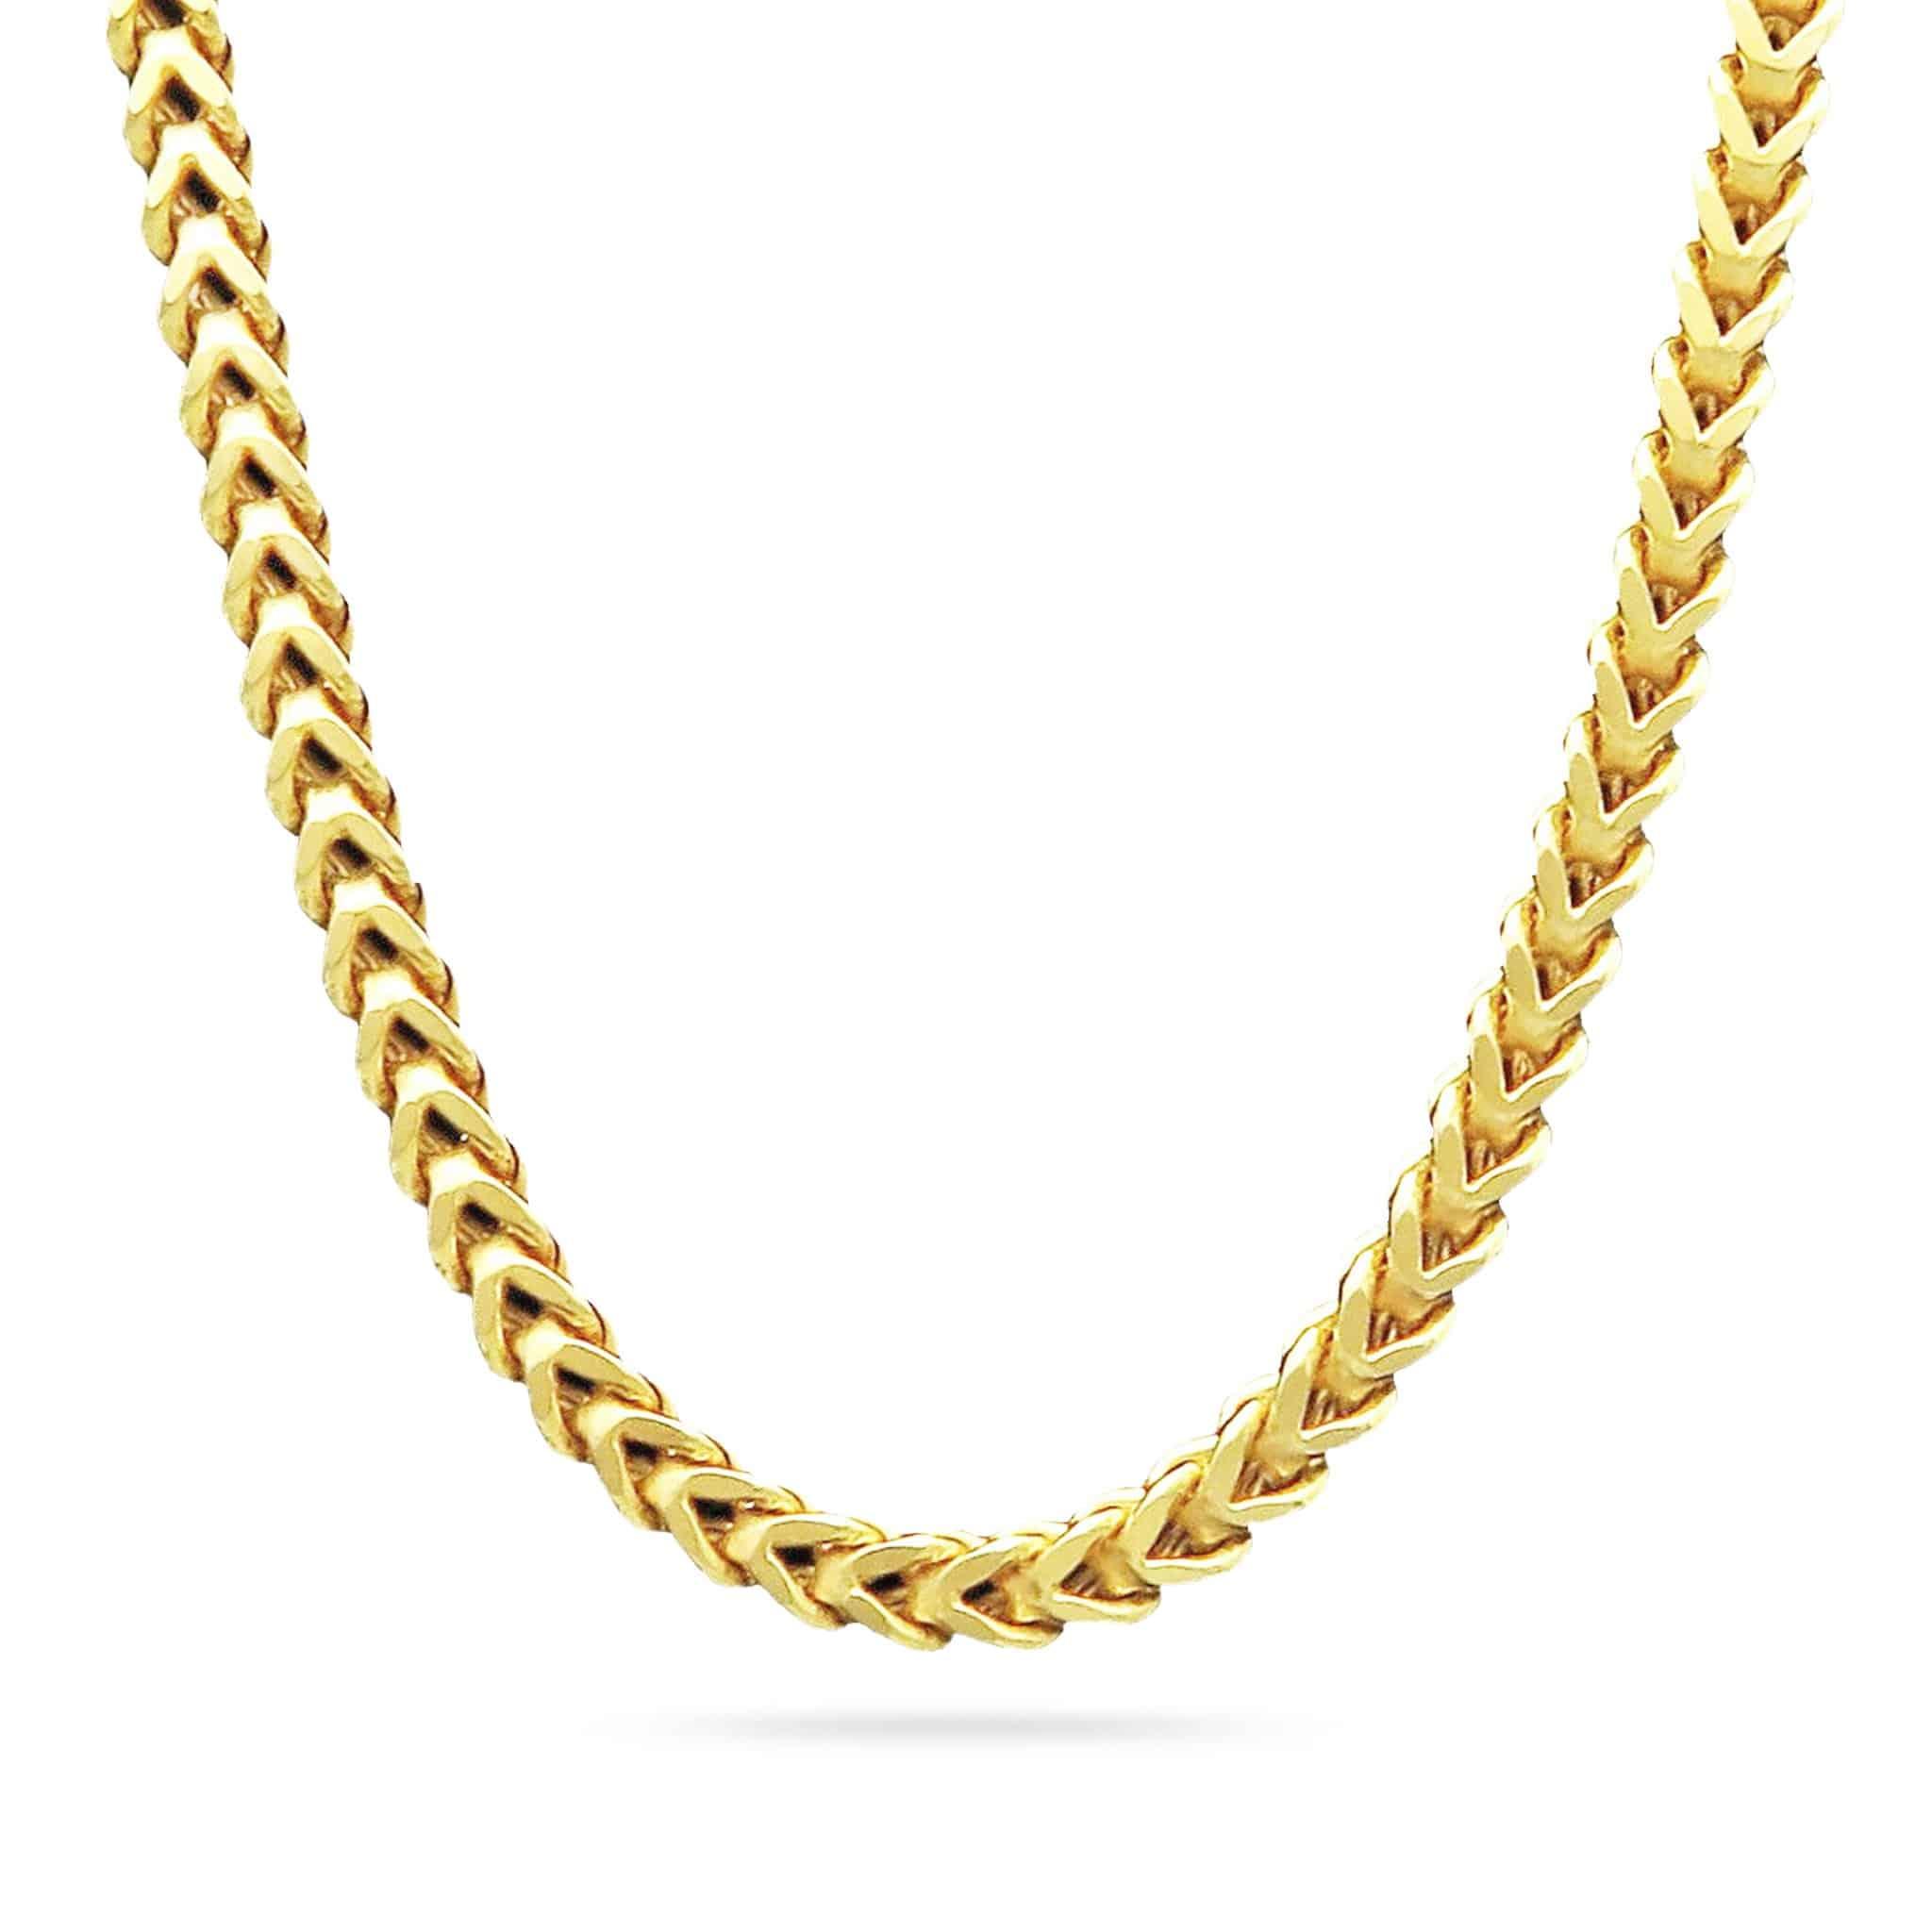 Franco chain